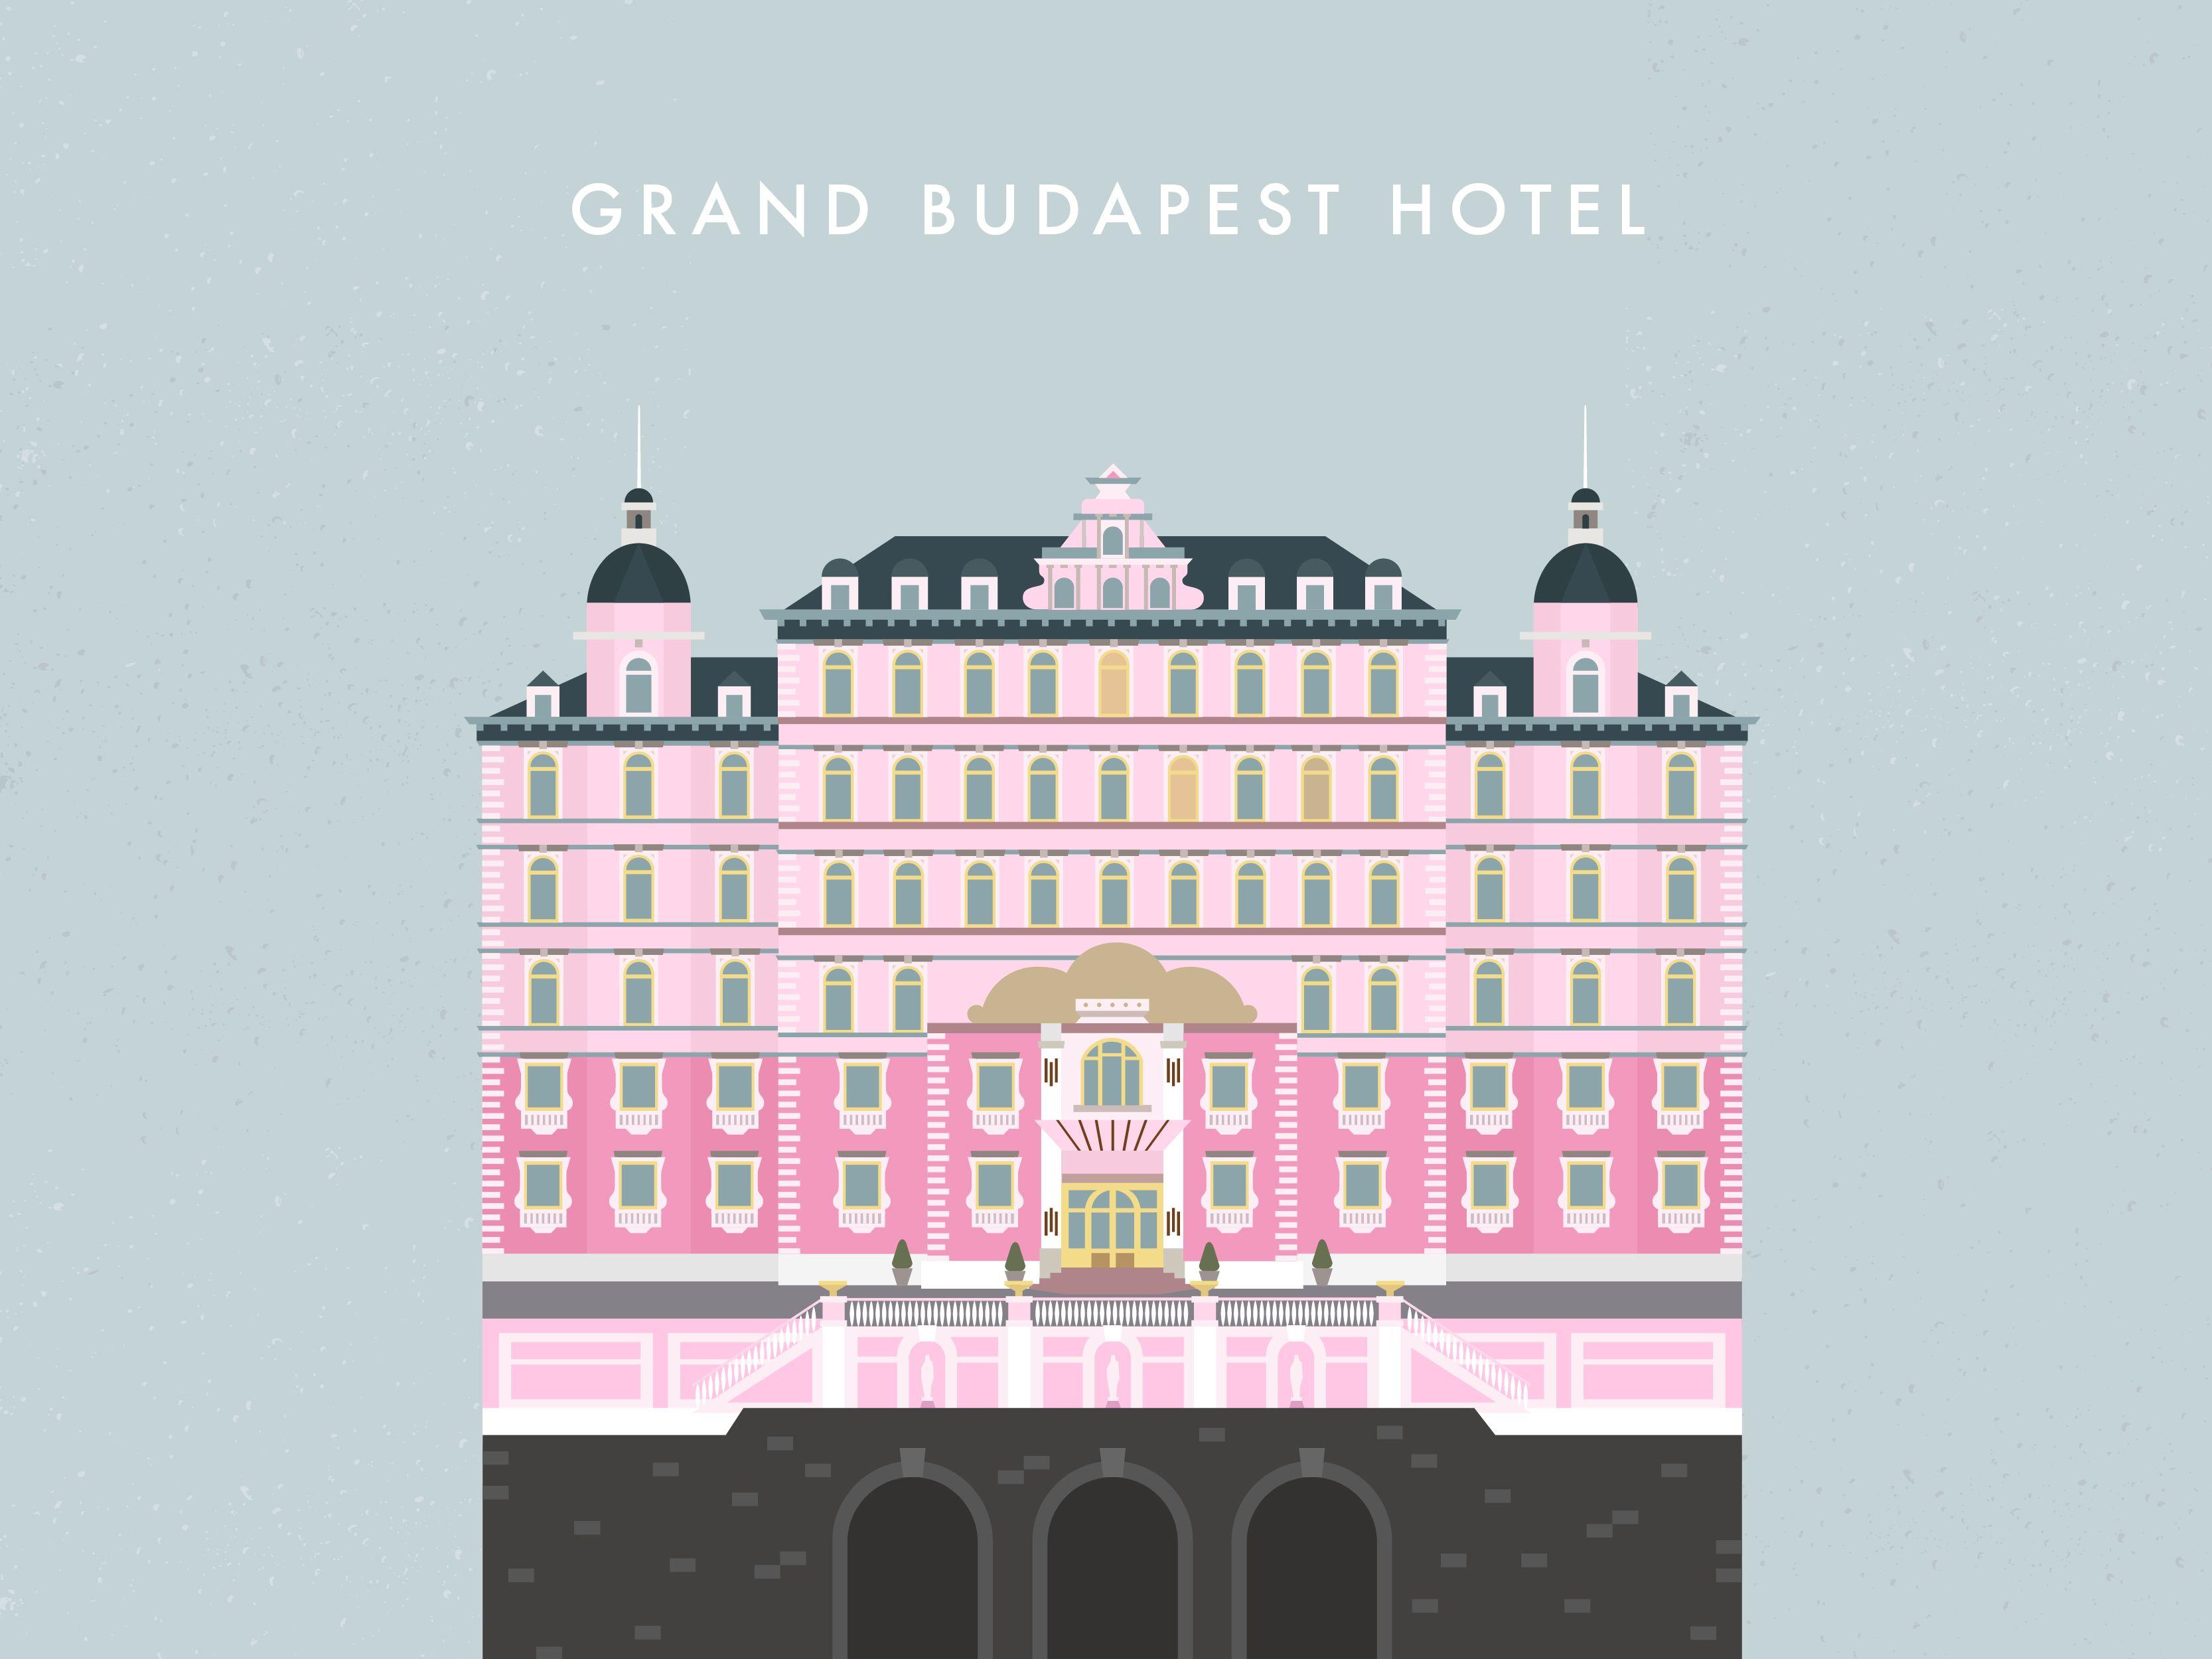 Grand Budapest hotel desktop wallpaper 3333x2500